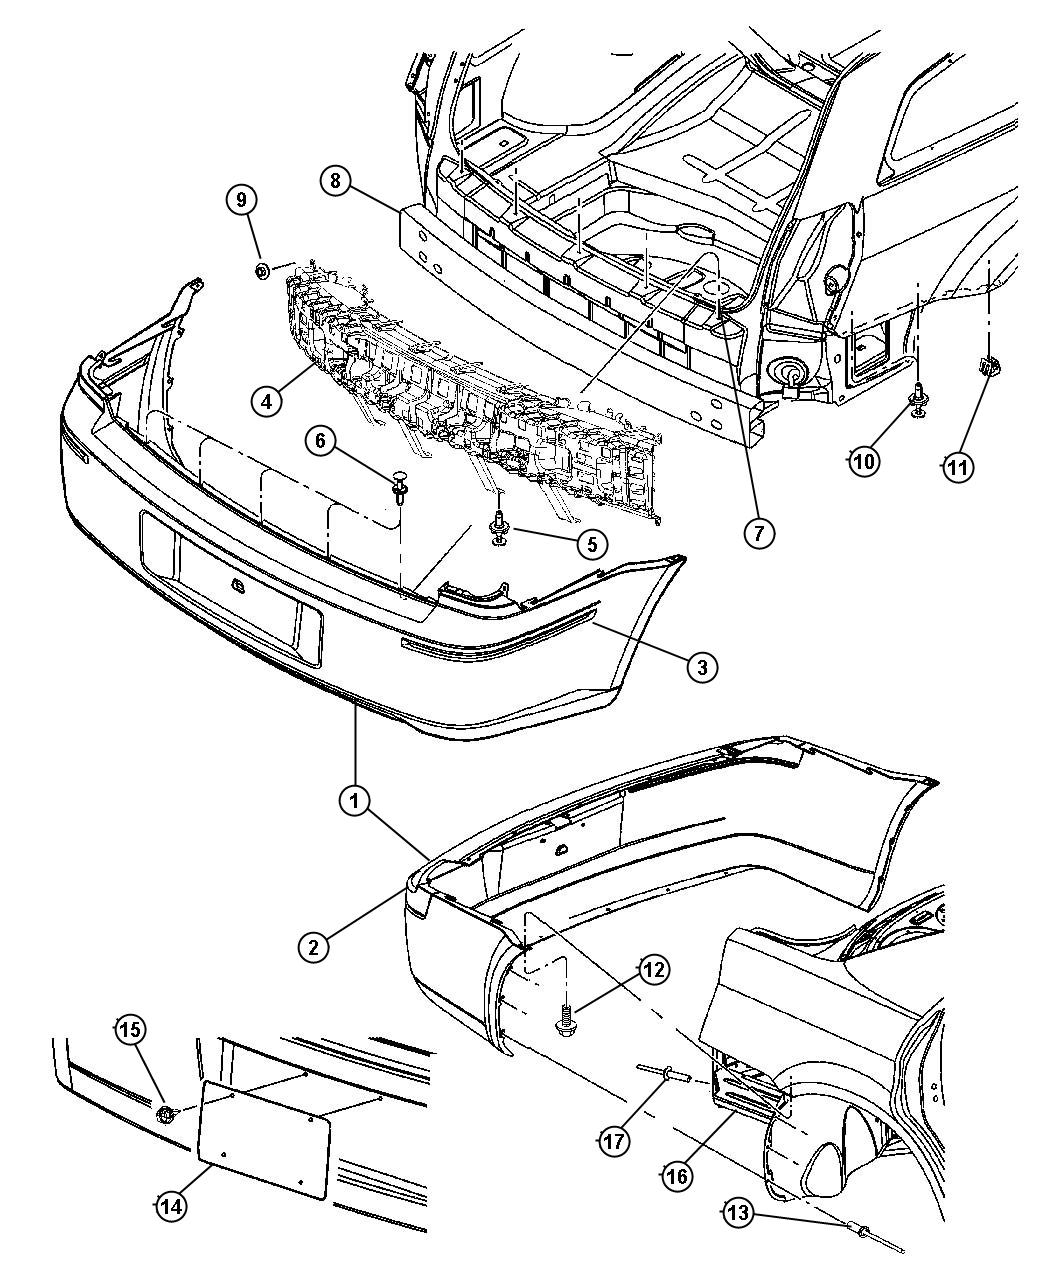 Dodge Fascia Rear With Sales Code Rear Dual